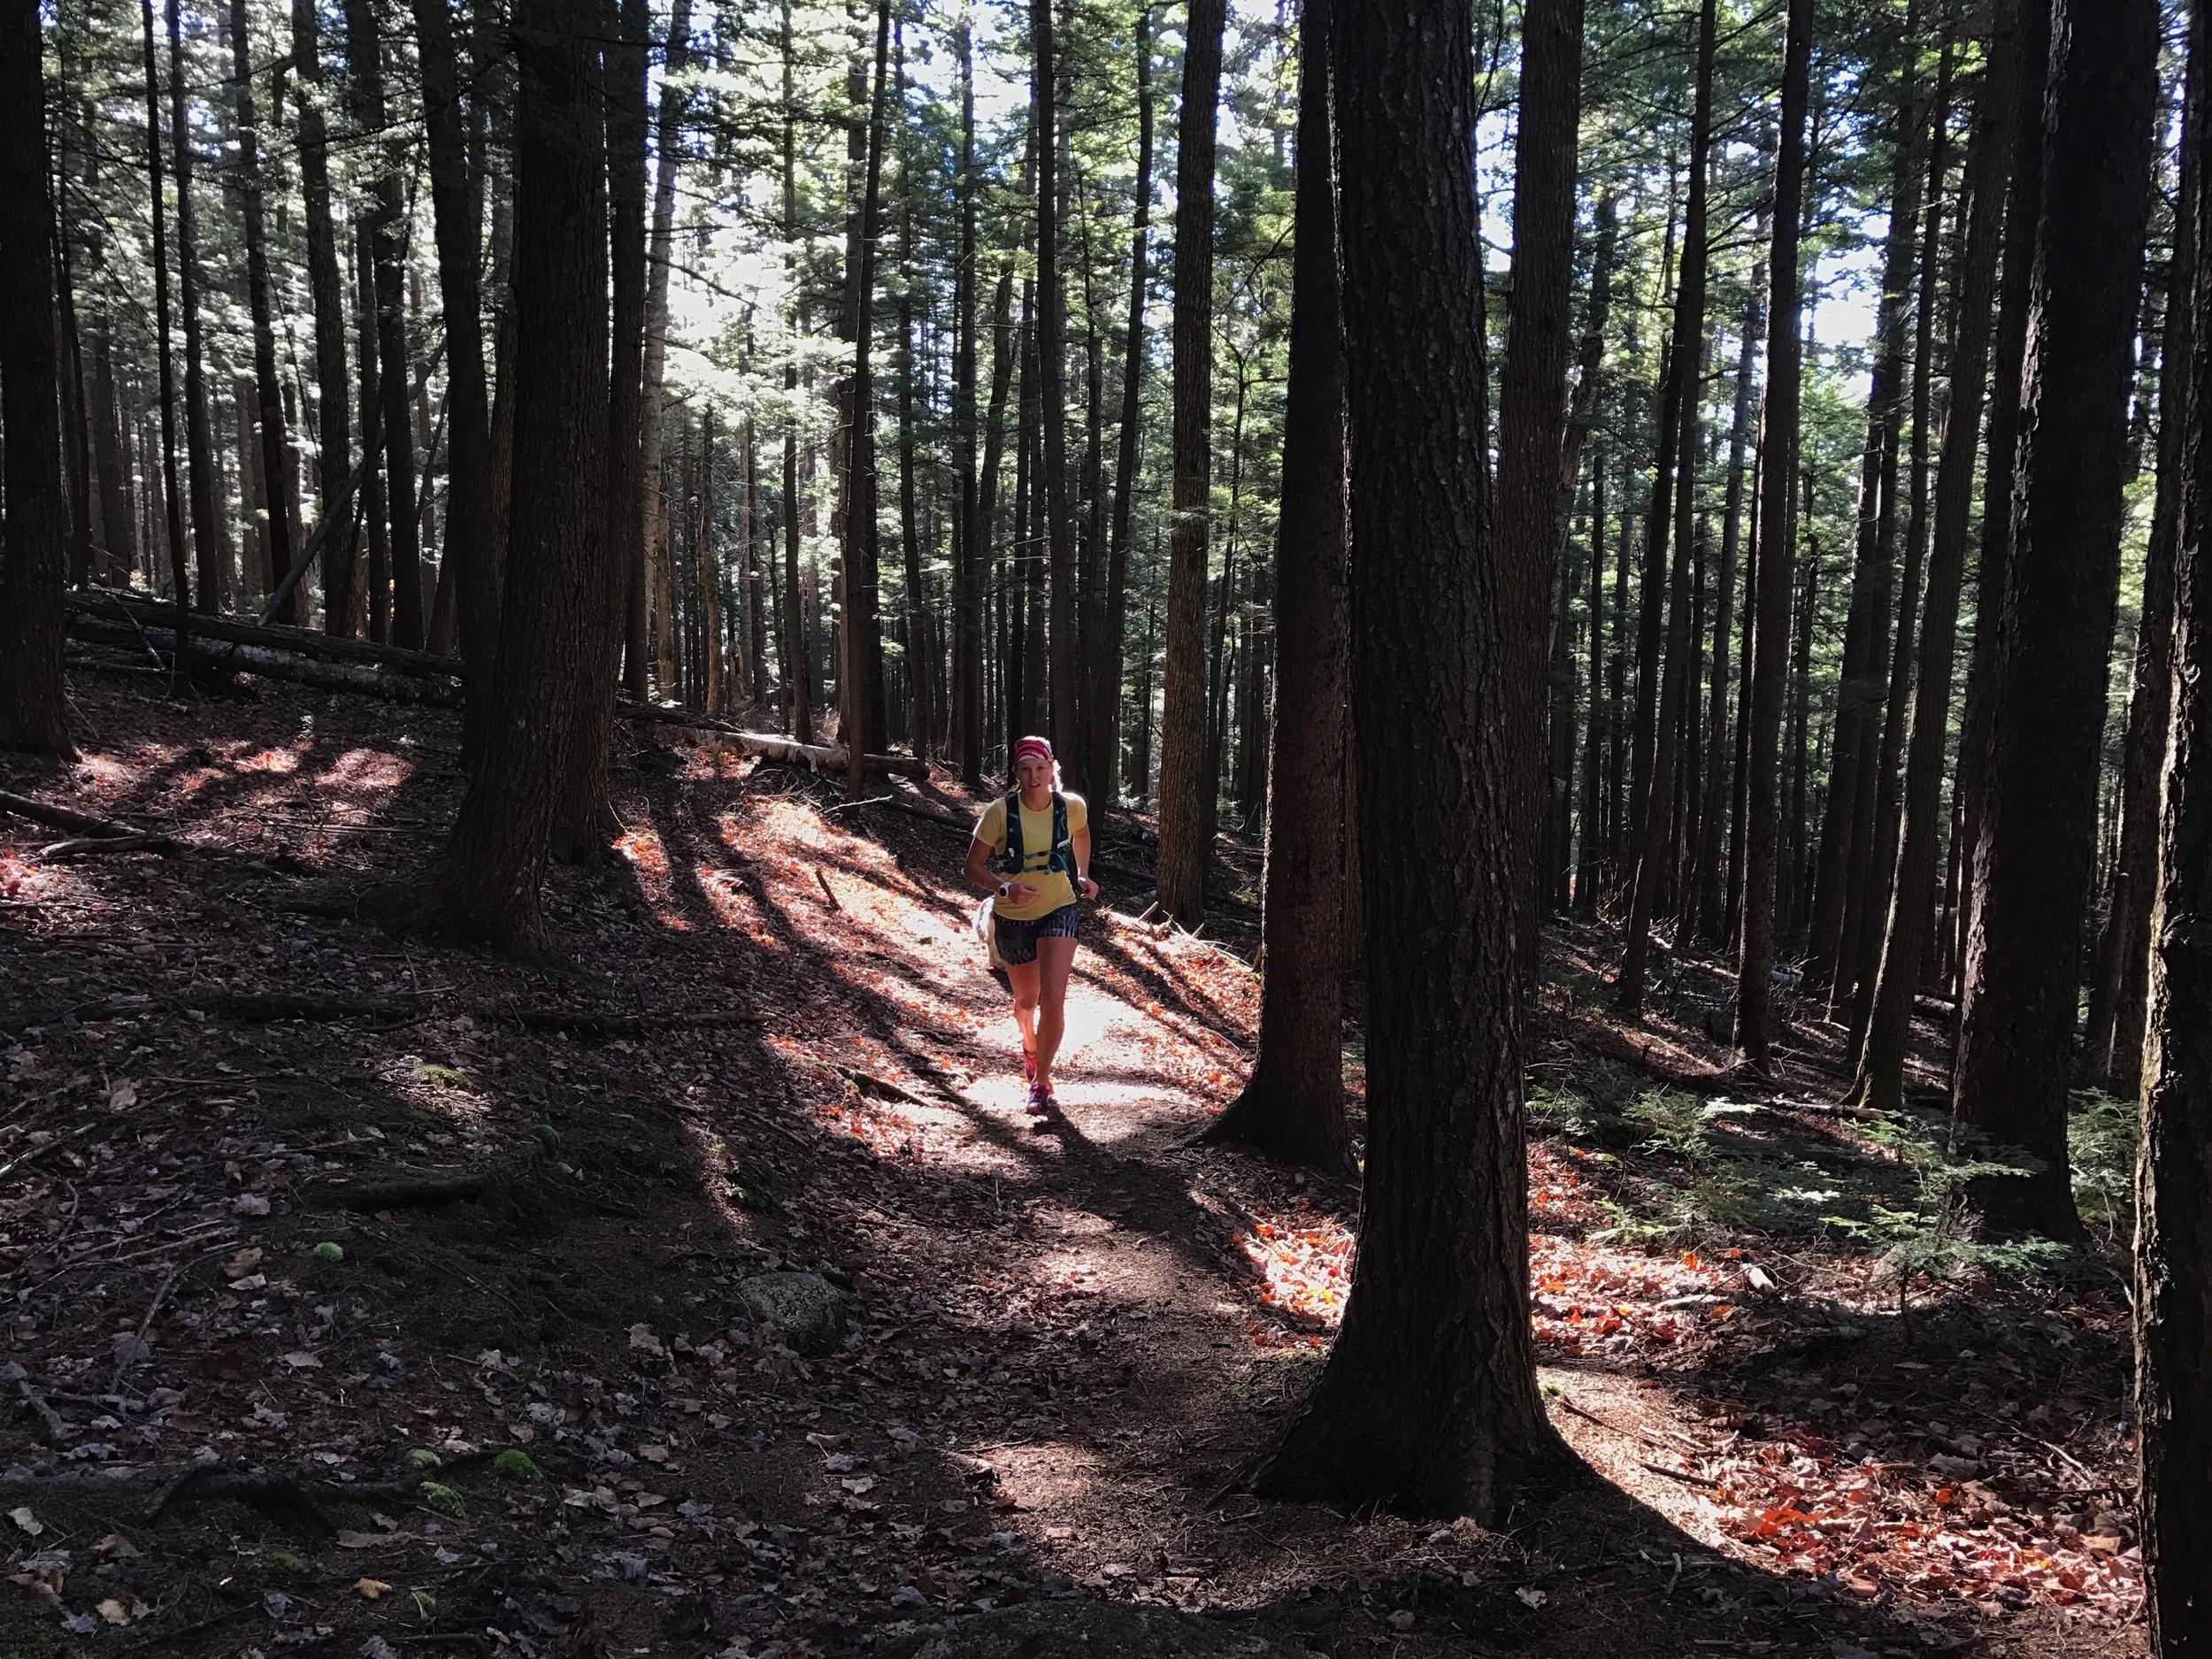 Fall trail run on the Tamworth side of Mt. Chocorua.